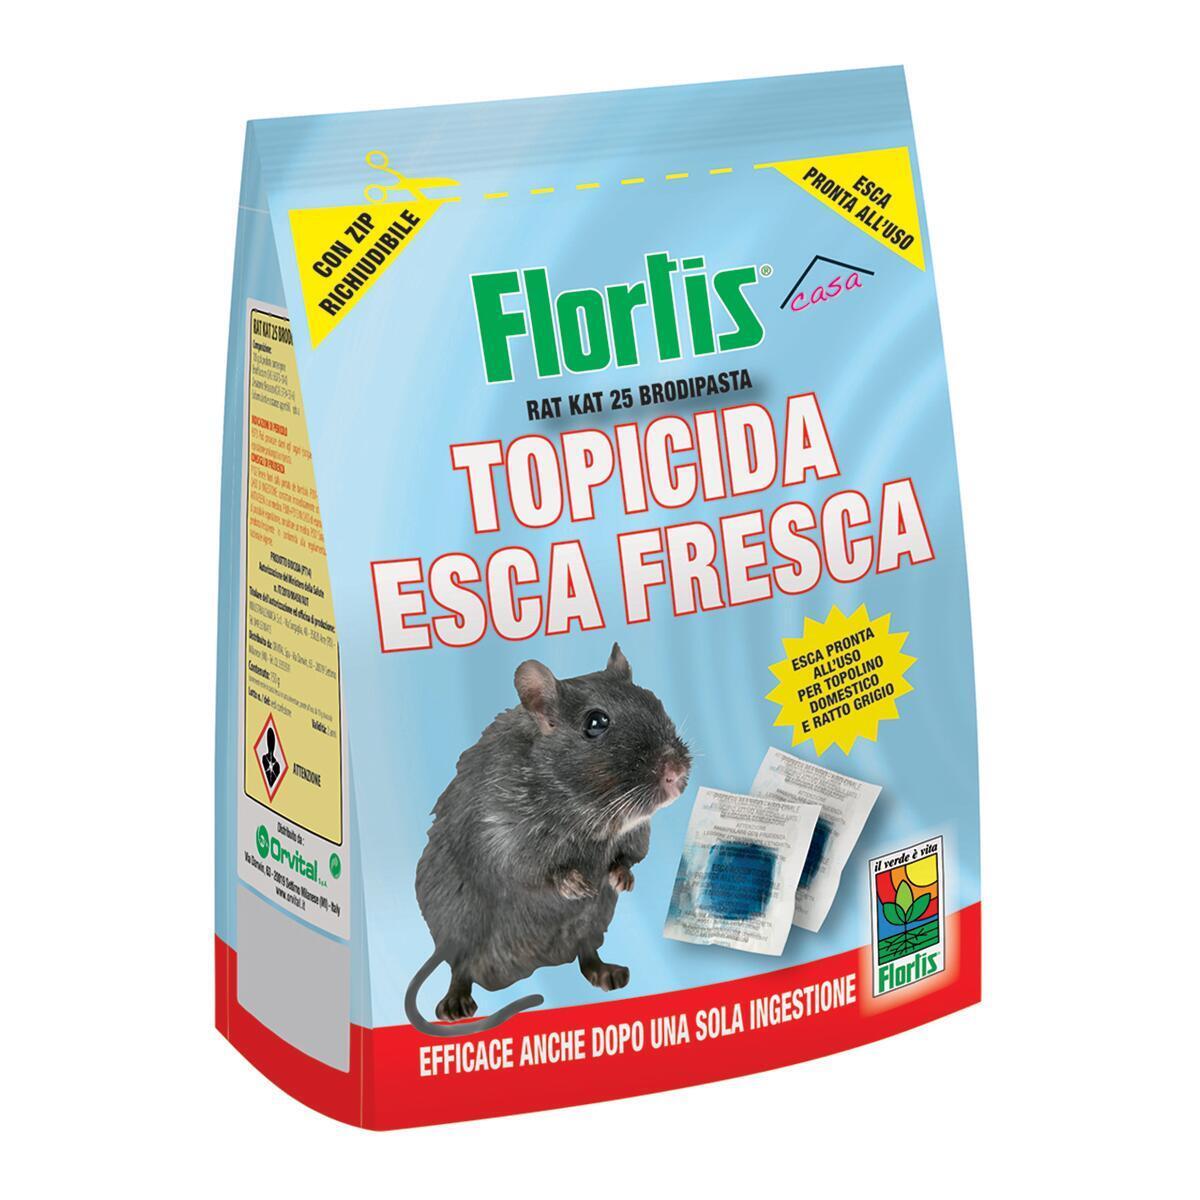 Esca per ratto e topo e talpa FLORTIS Topicida 150 g